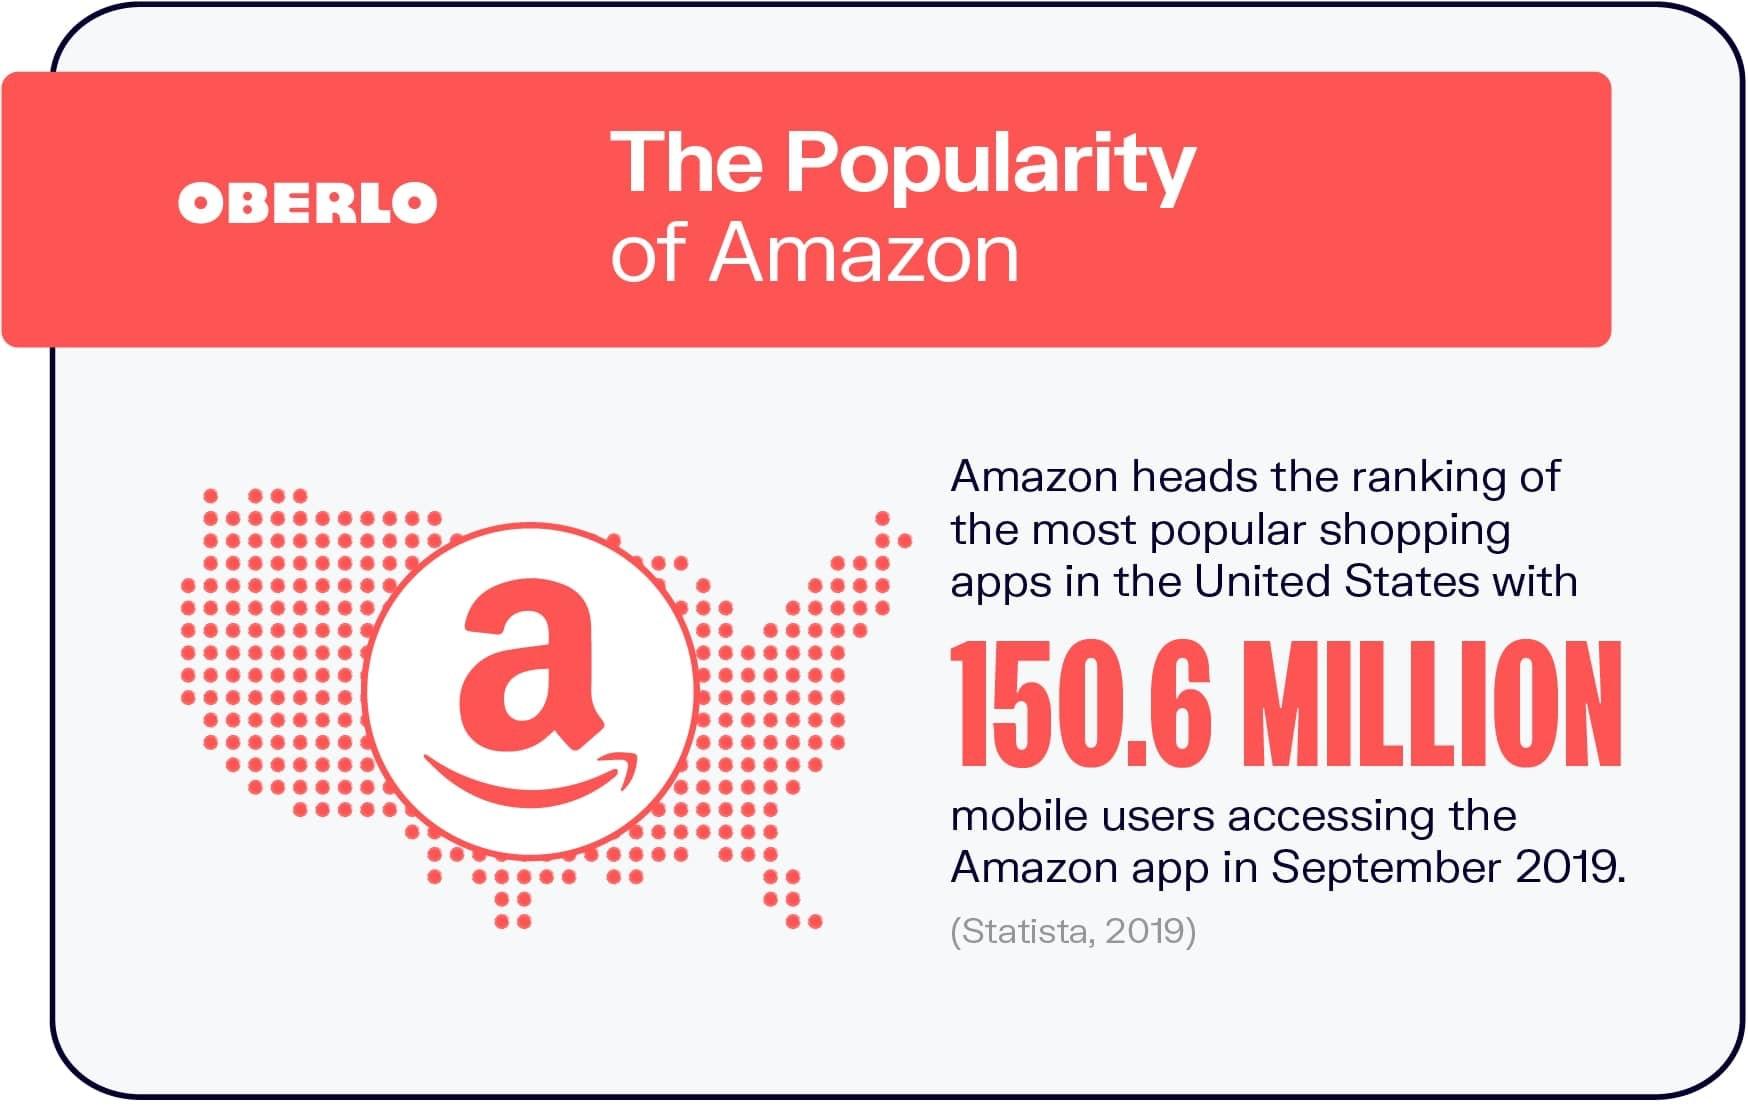 The Popularity of Amazon